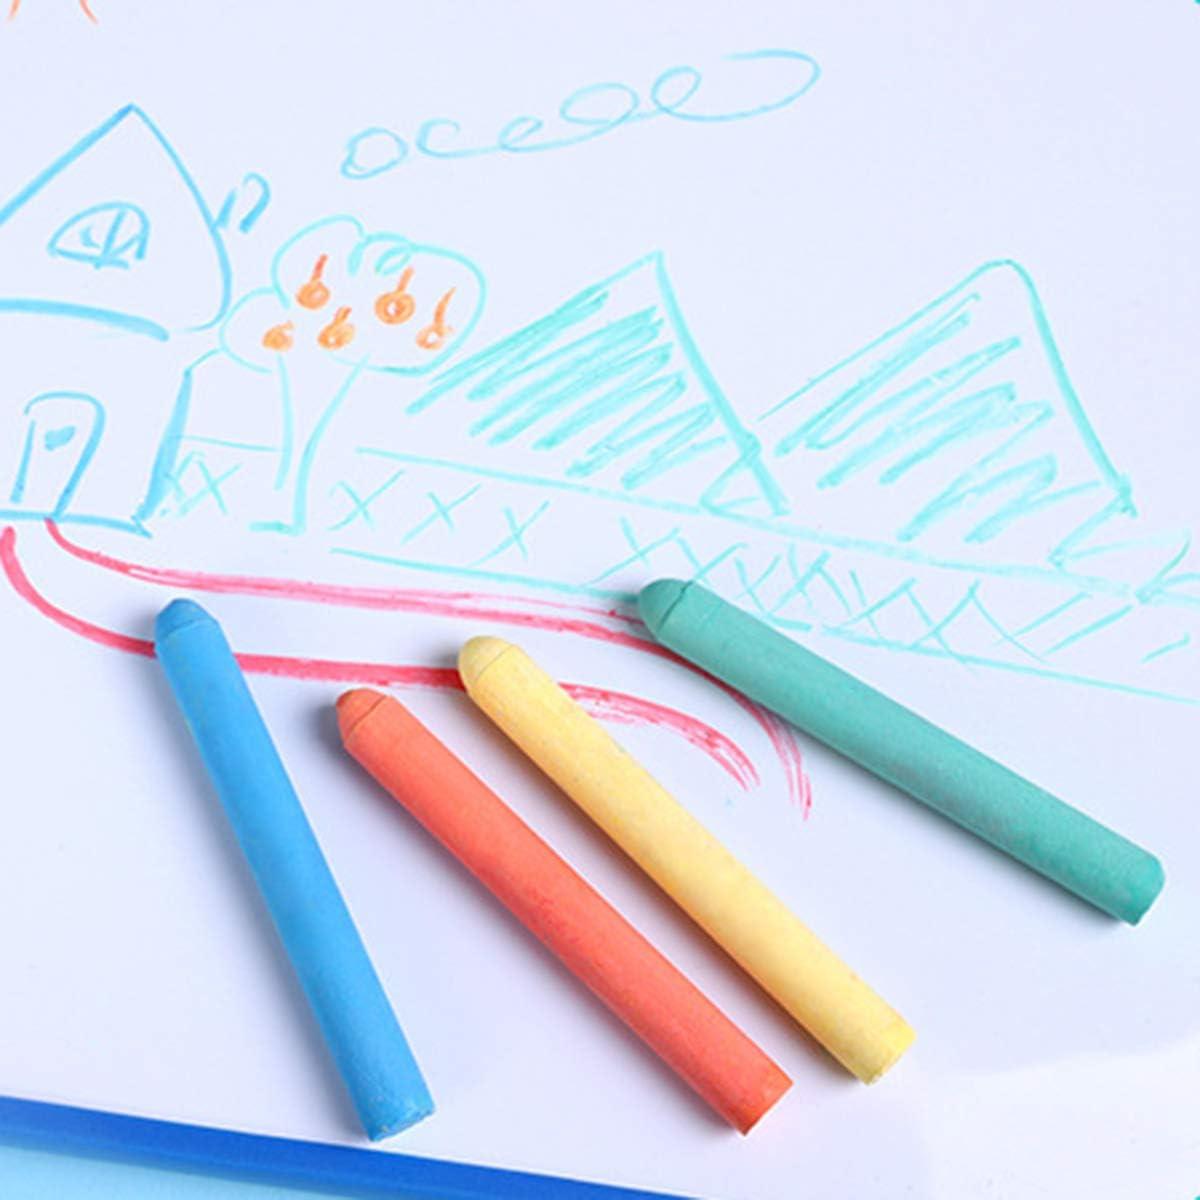 Assorted Color Large Hopscotch Chalk Giant STREET CHALKS Fun Art Game Borlai 20Pcs Chalk